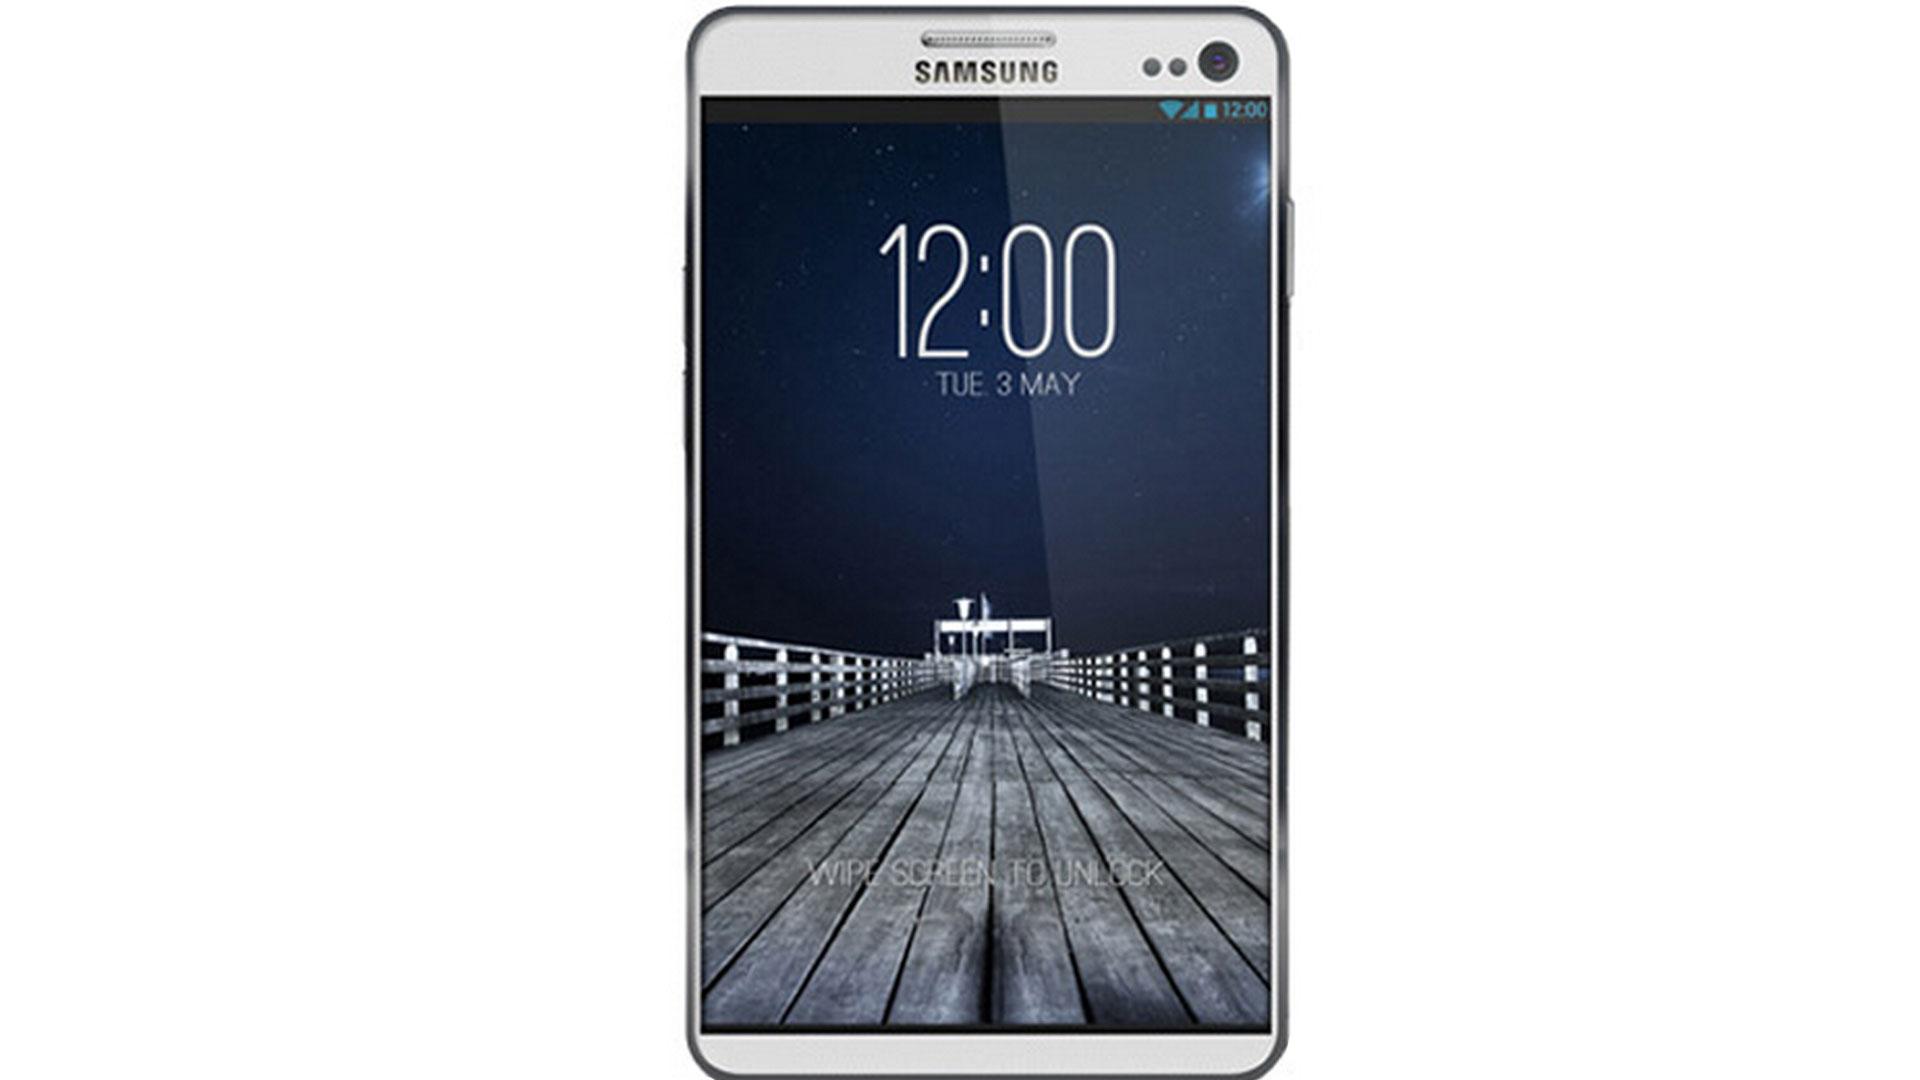 White Samsung Galaxy S4 Wallpaper HD Desktop 12229 Wallpaper 1920x1080